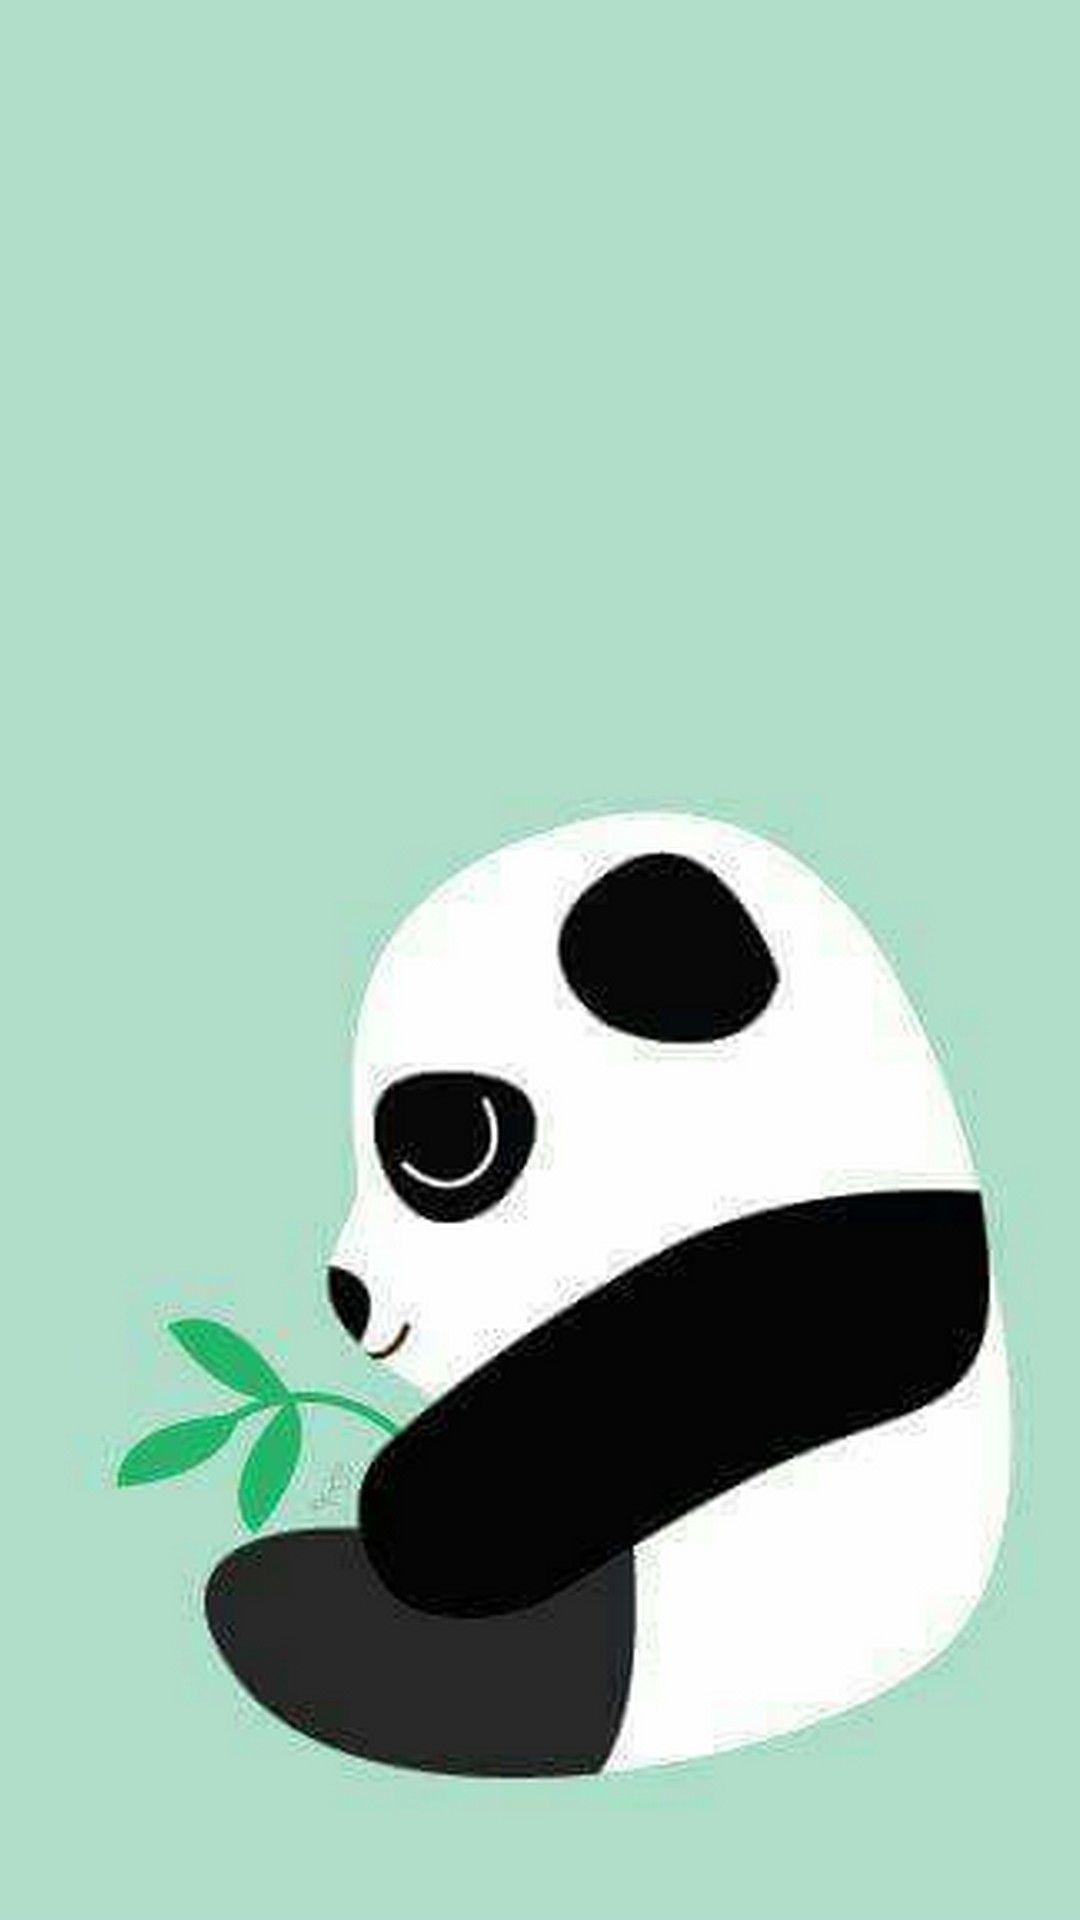 Wallpaper Baby Panda Mobile Best Hd Wallpapers Cute Panda Wallpaper Hd Cute Wallpapers Panda Wallpapers